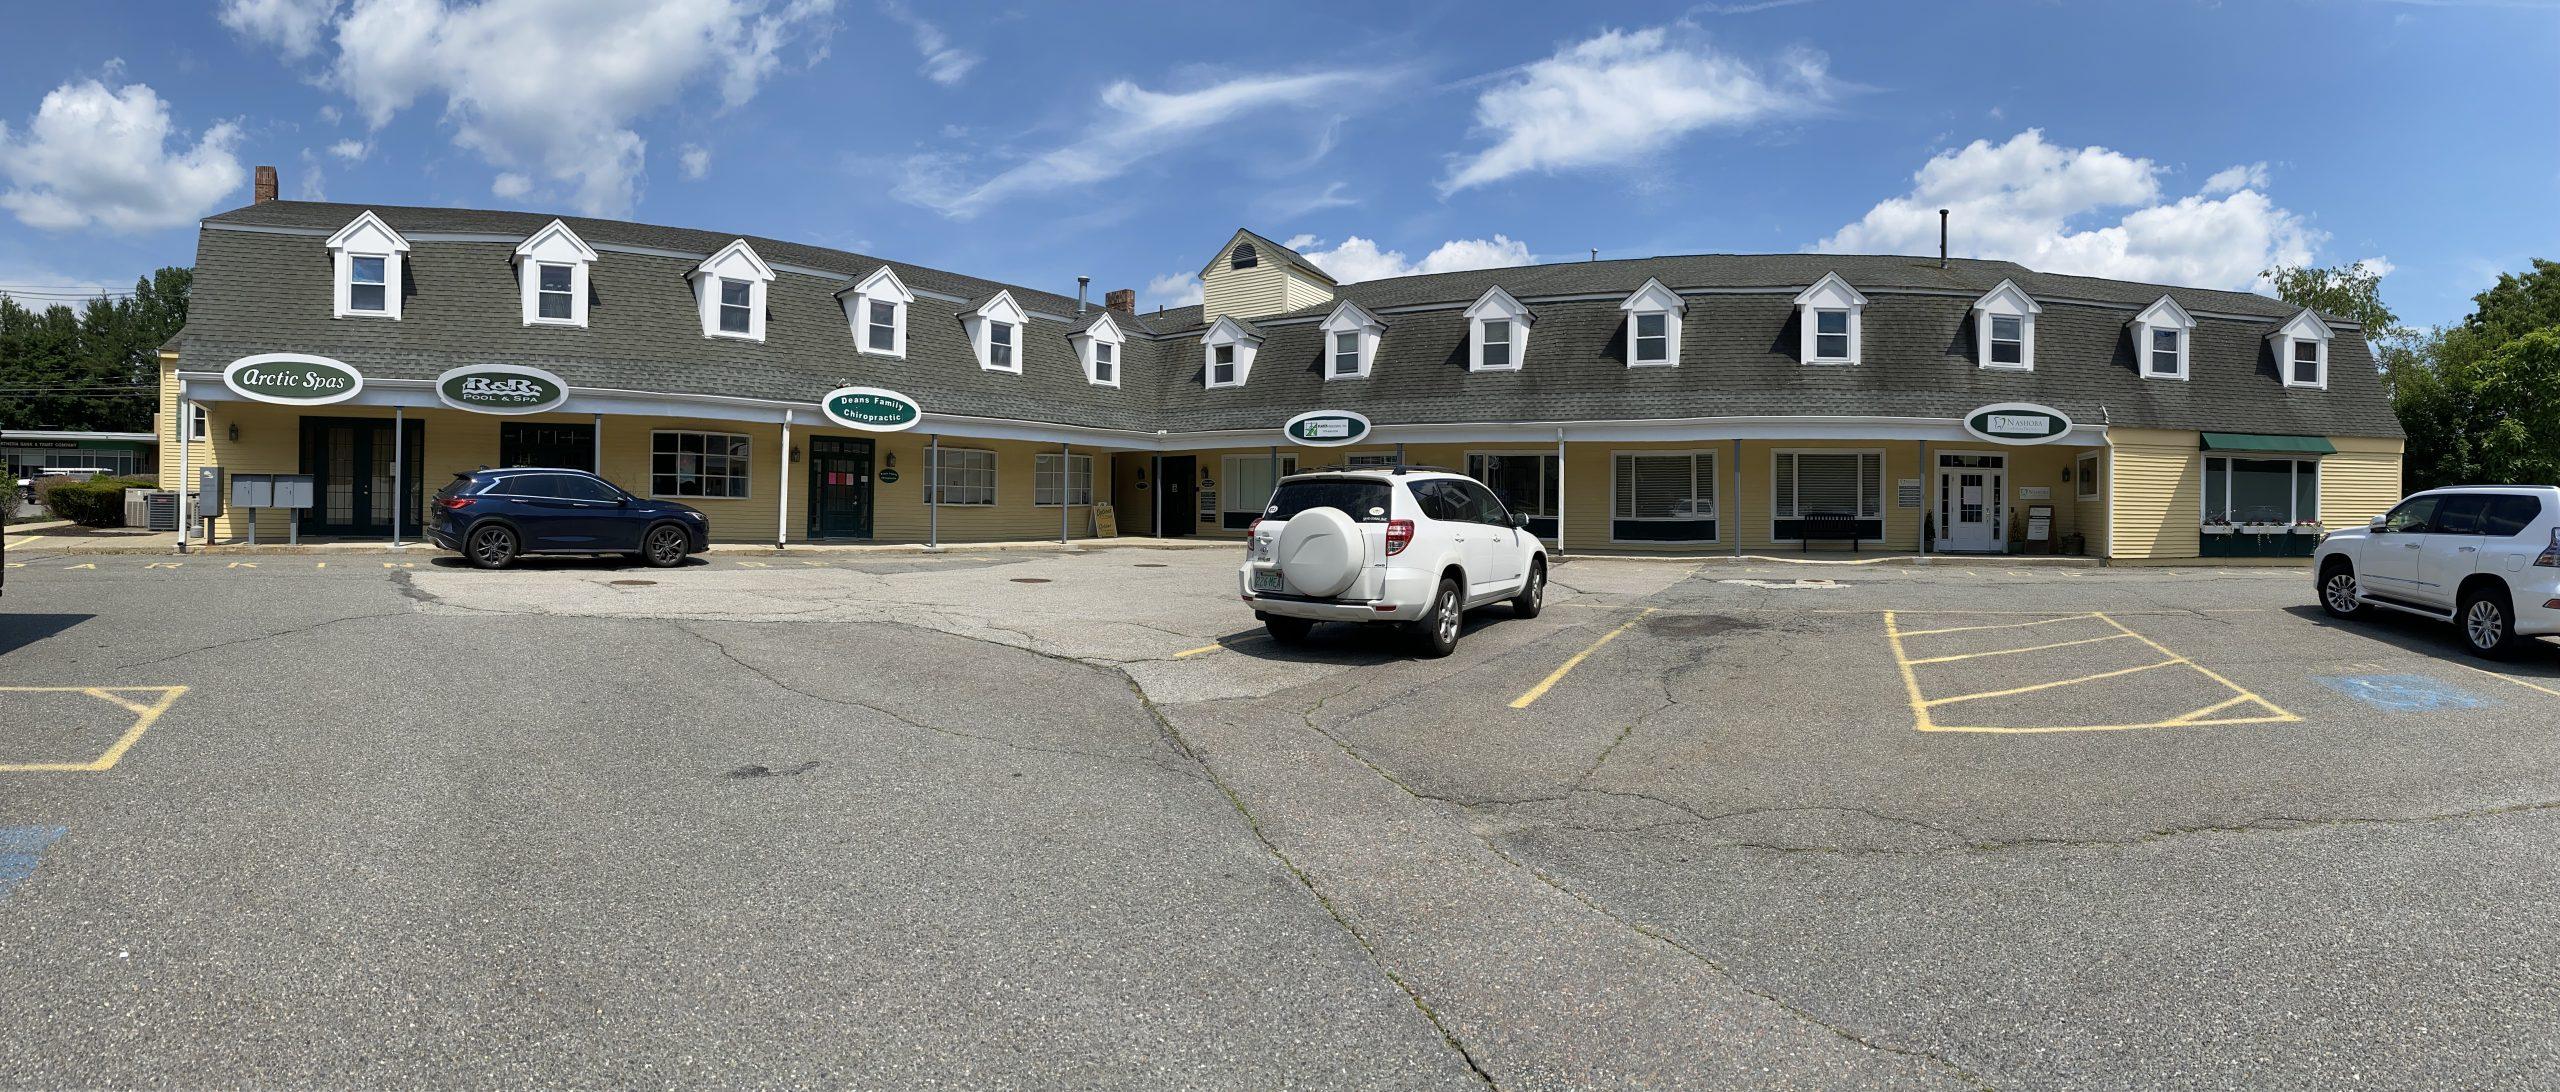 256 Great Road, Suite 11, Littleton, MA